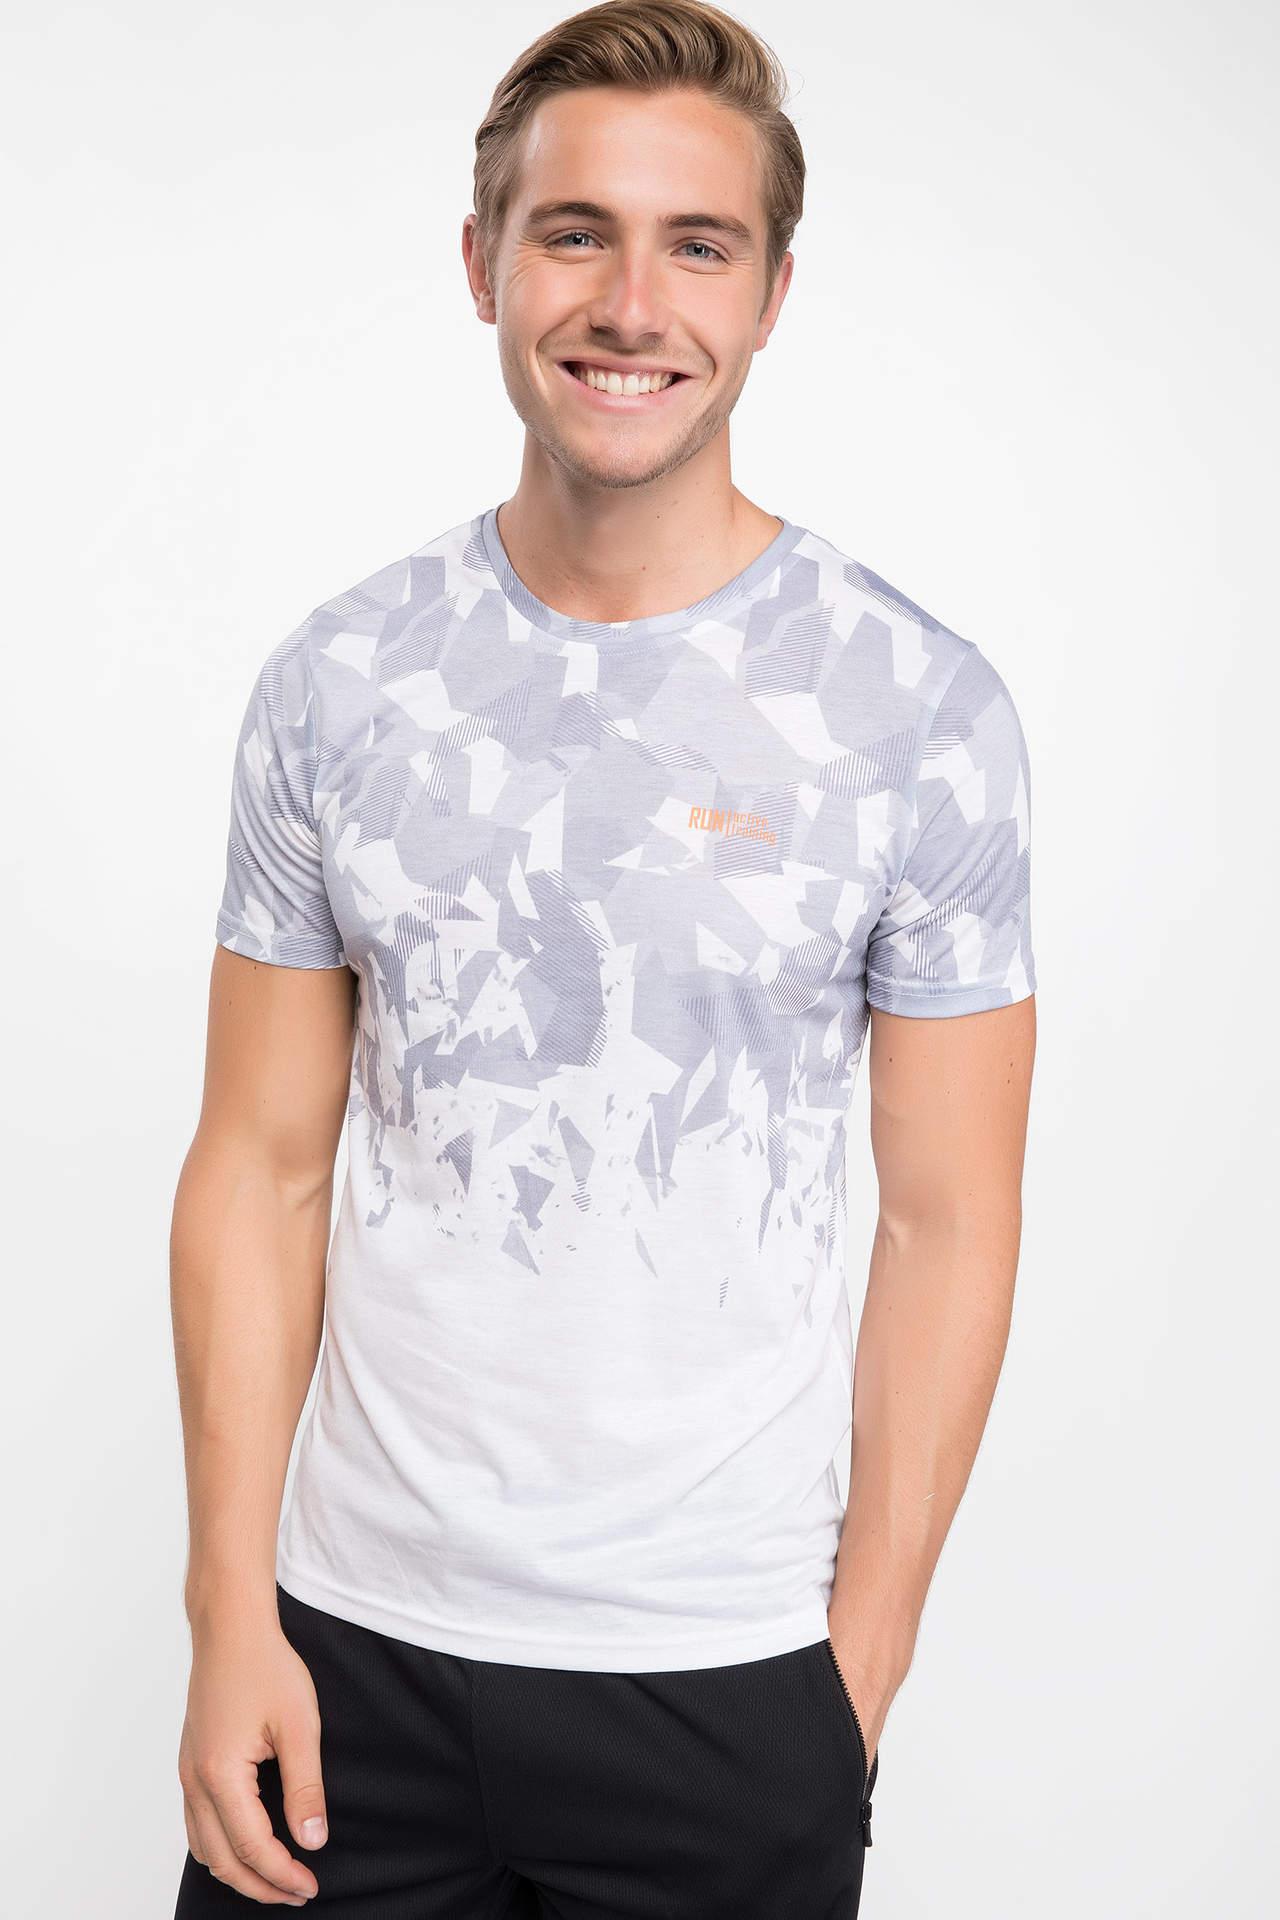 DeFacto Erkek Geometrik Desenli Bisiklet Yaka Sporcu T-shirt Beyaz male